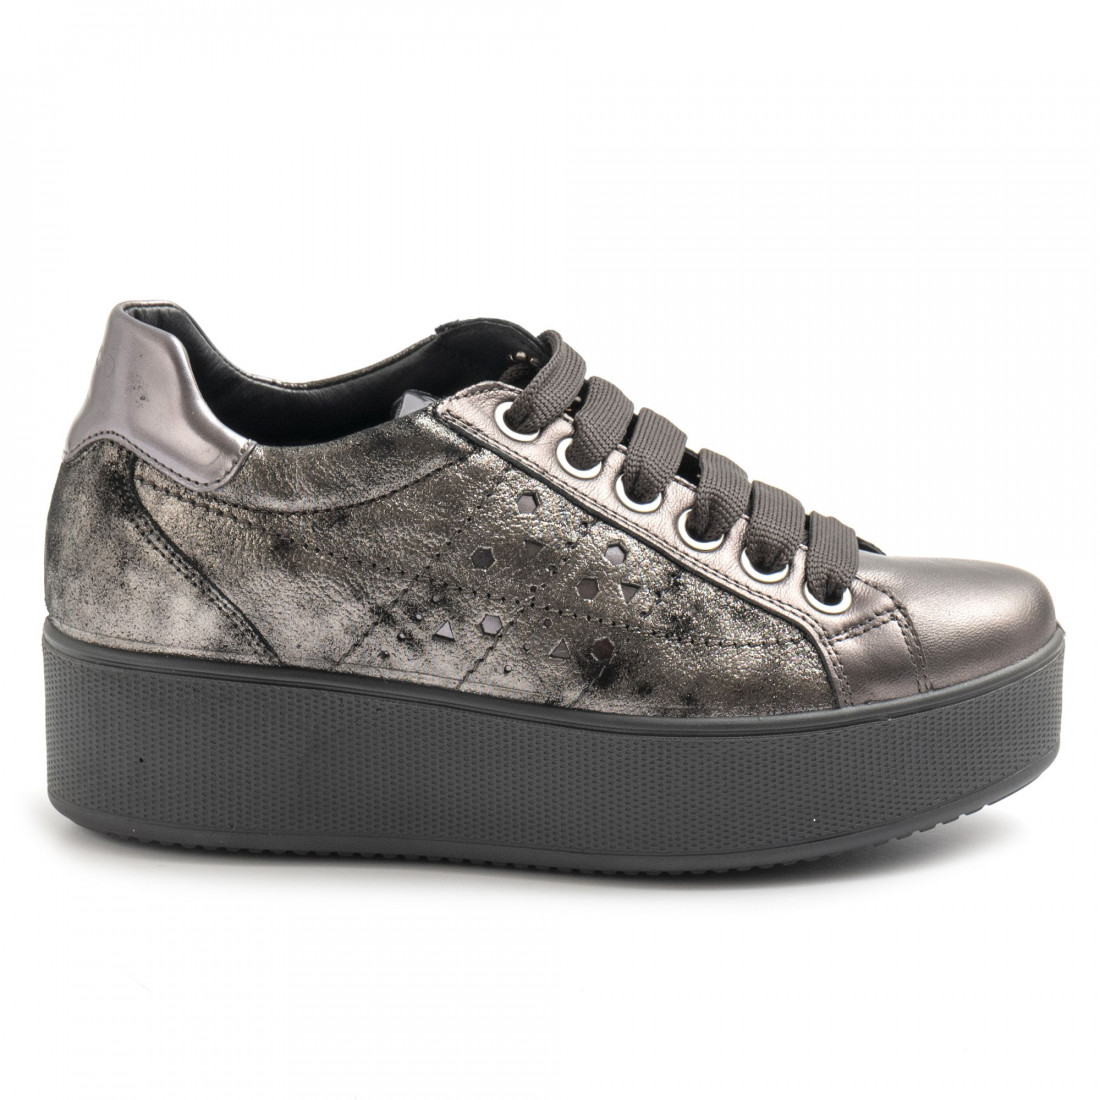 sneakers woman igico 415222241522 6231